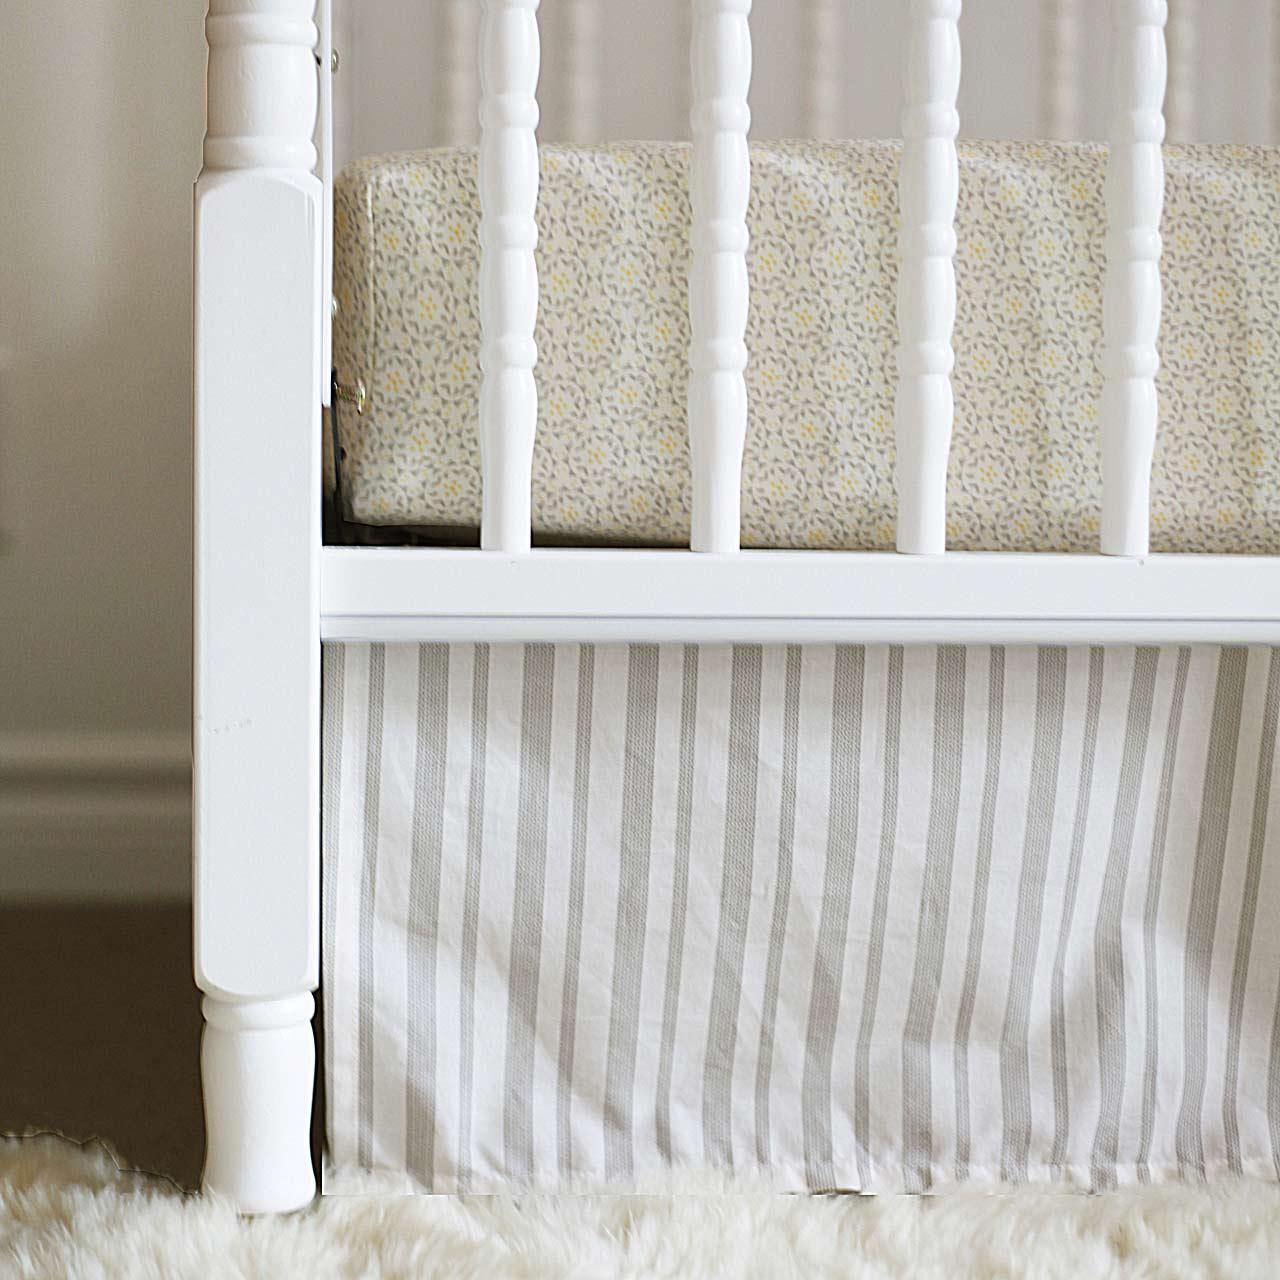 om home organic cotton crib sheet review  - om home avnee gray